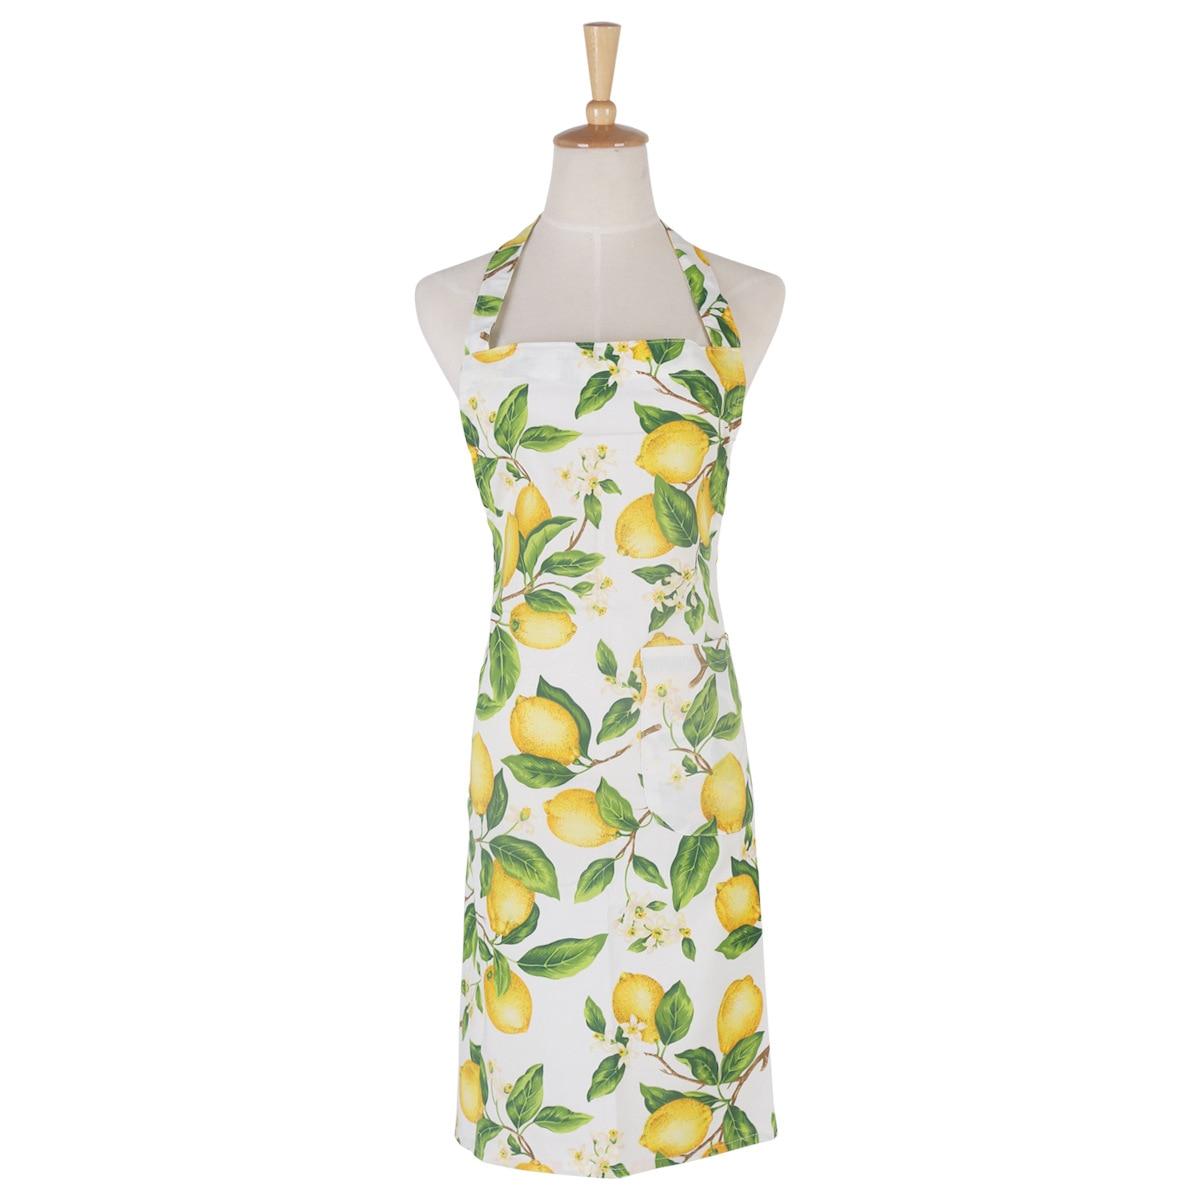 White pinafore apron nurse - Women Yellow Lemons Cotton Apron Vintage Kitchen Cooking Cuisine Pinafore Retro Pockets Apron China